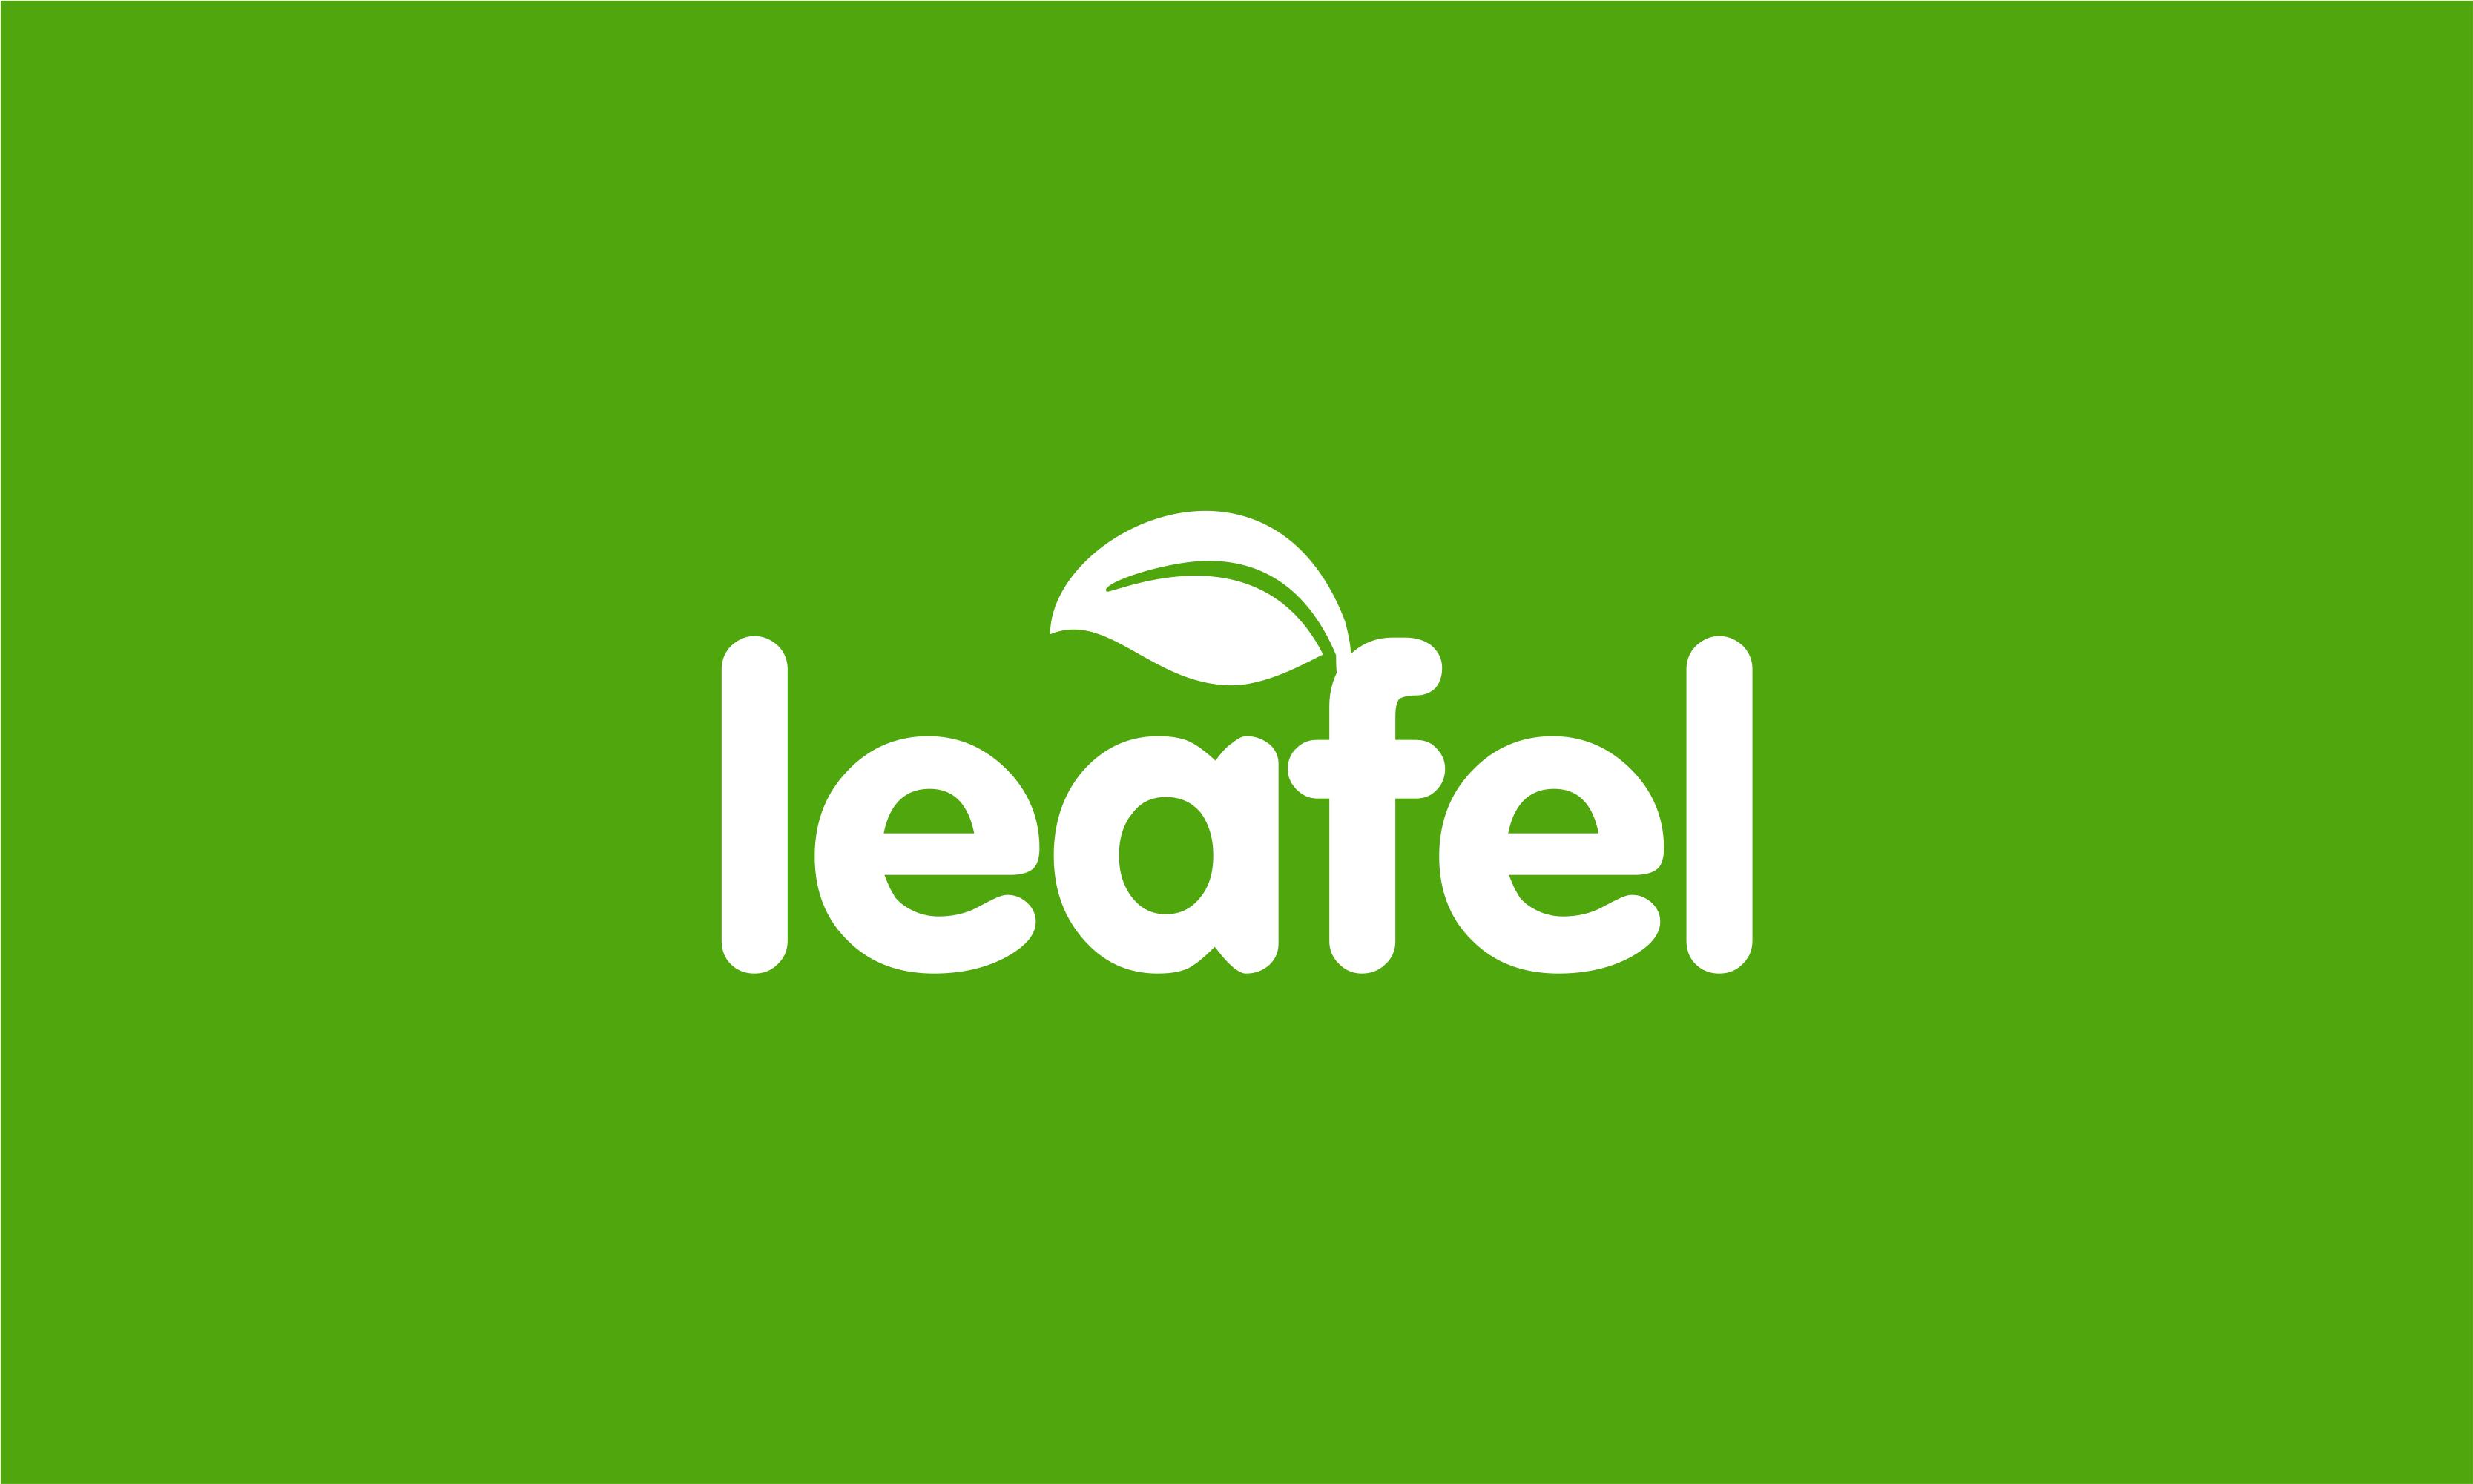 Leafel